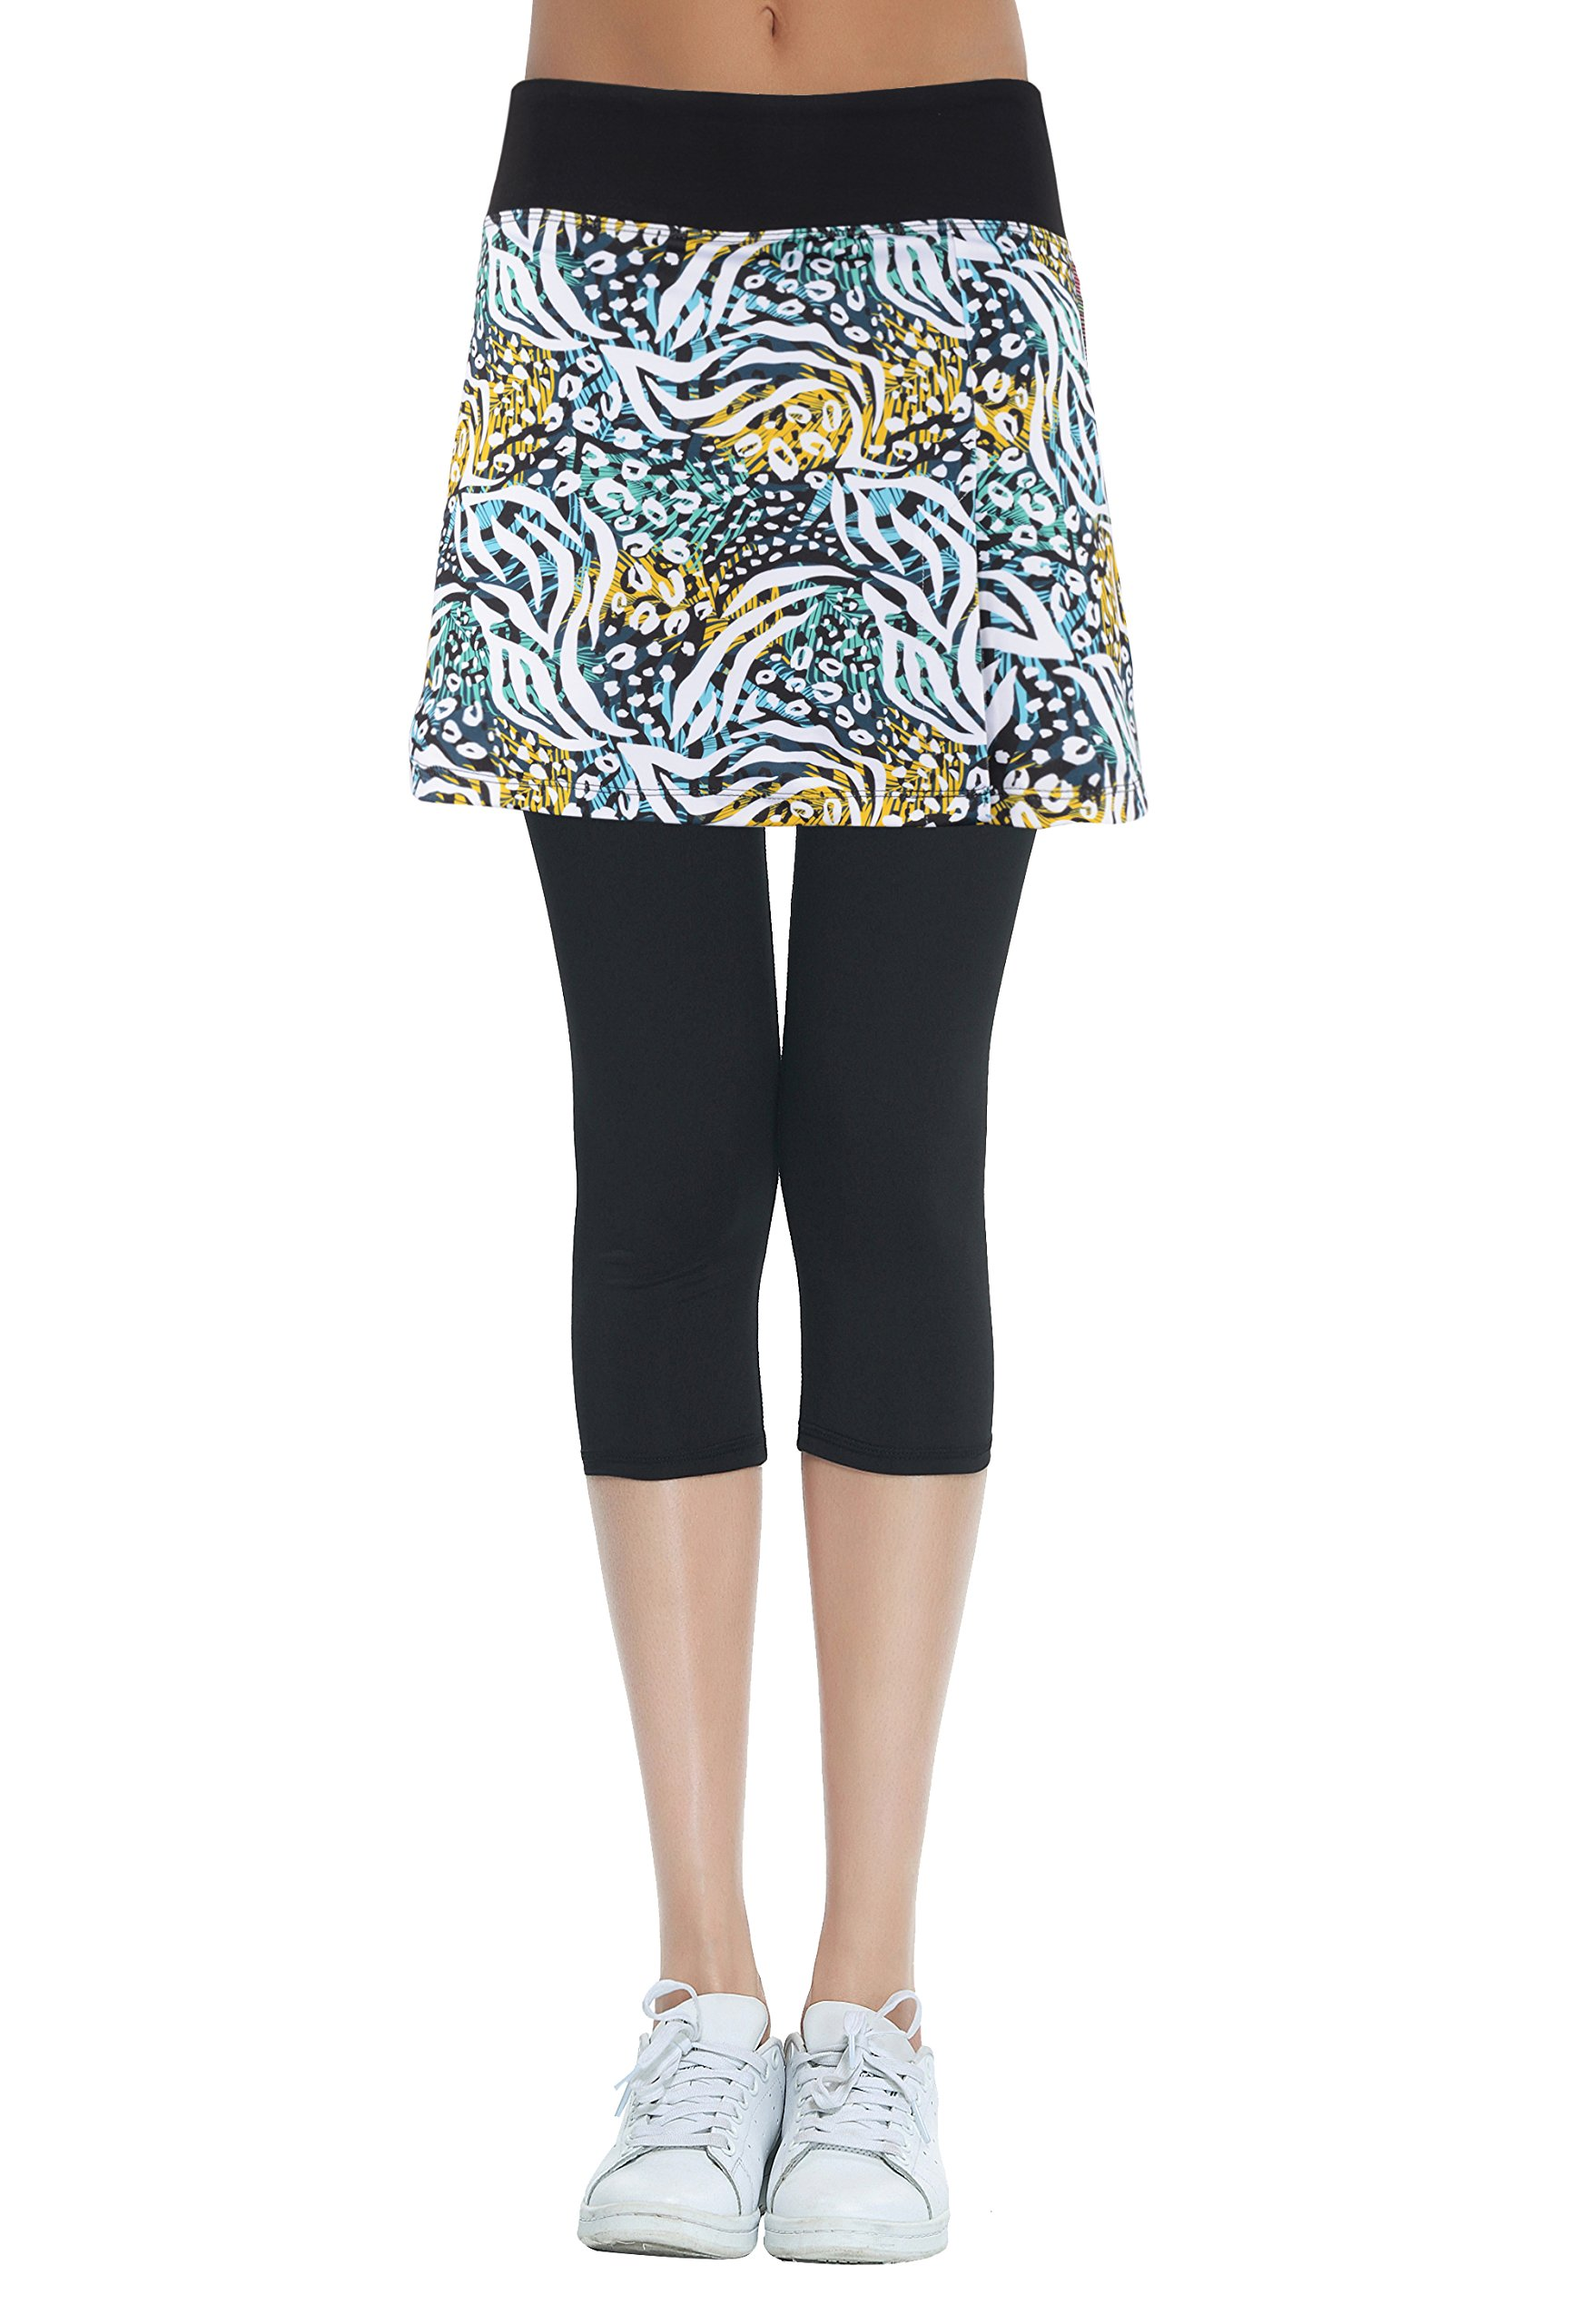 HonourSport Women's Skirted Capris Leggings,Side Slit Printed Tennis Skorts(Printed Leopard,L)